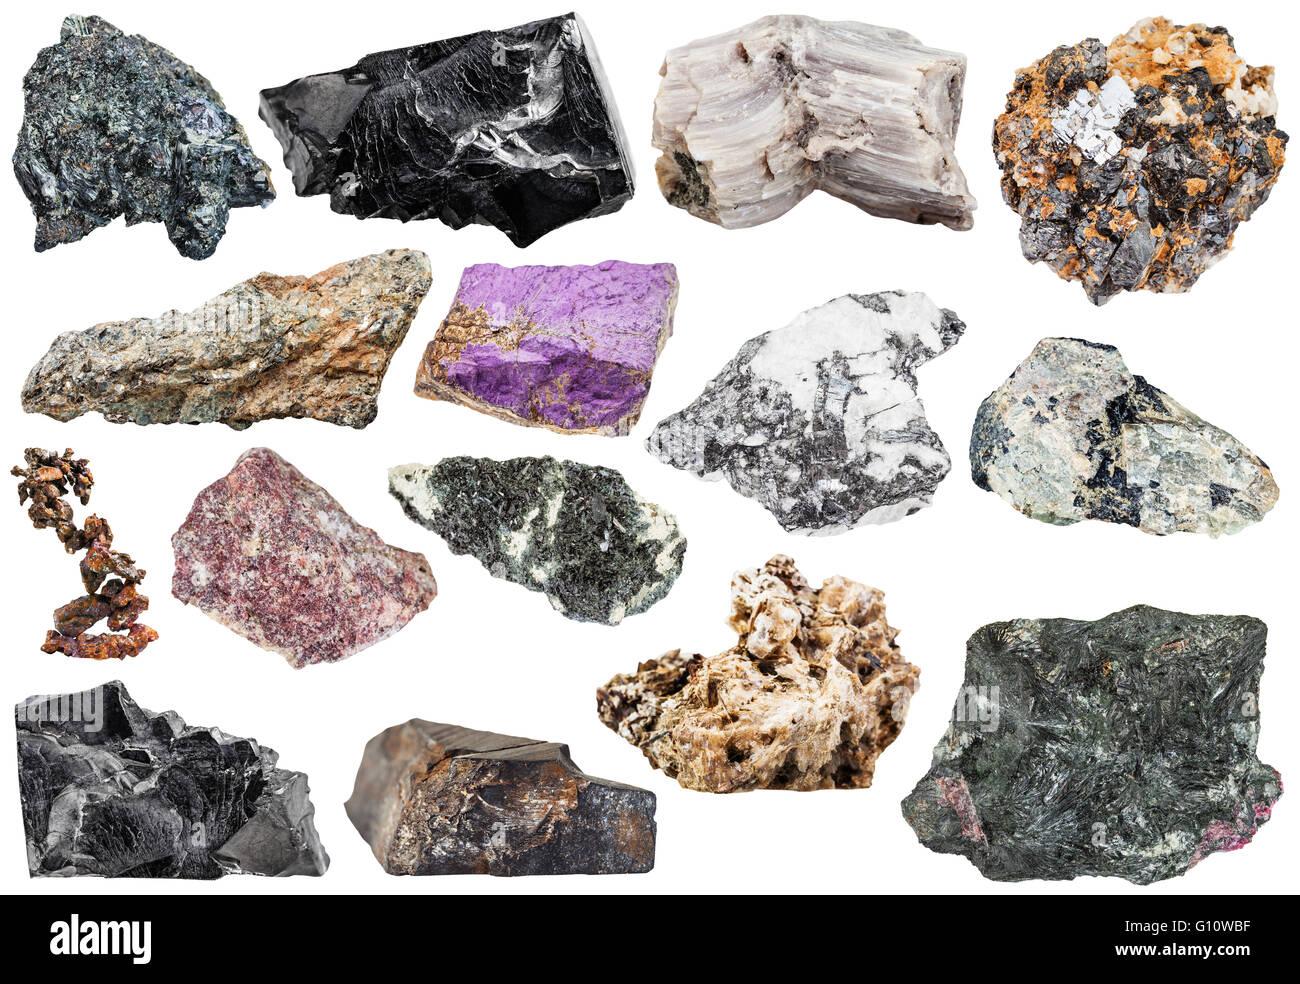 set of various natural mineral stones and rocks: copper, astrophyllite, shungite, baryte, hornblende, nepheline, - Stock Image